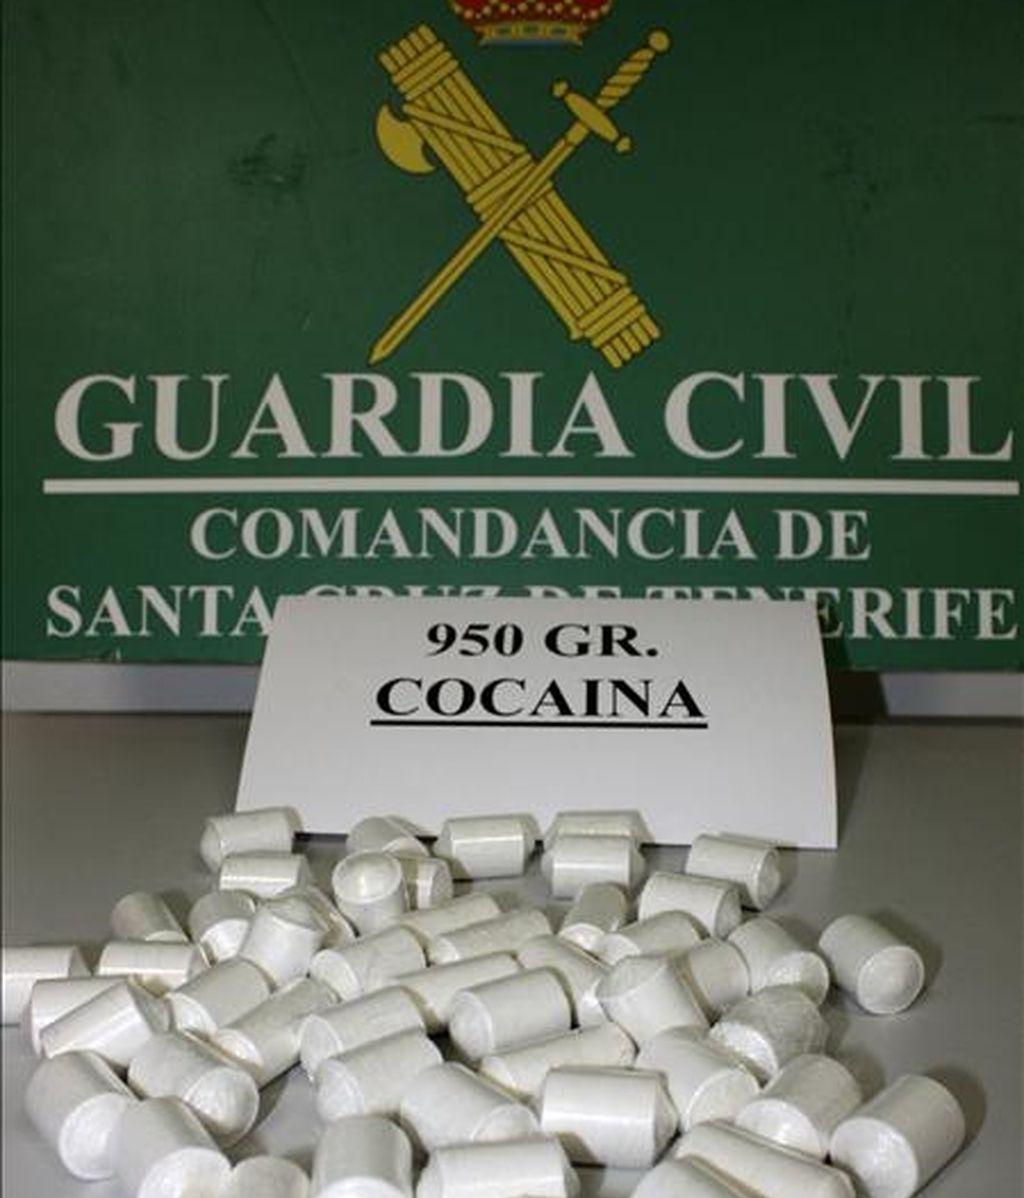 Vista de cocaína incautada por la Guardia Civil. EFE/Archivo